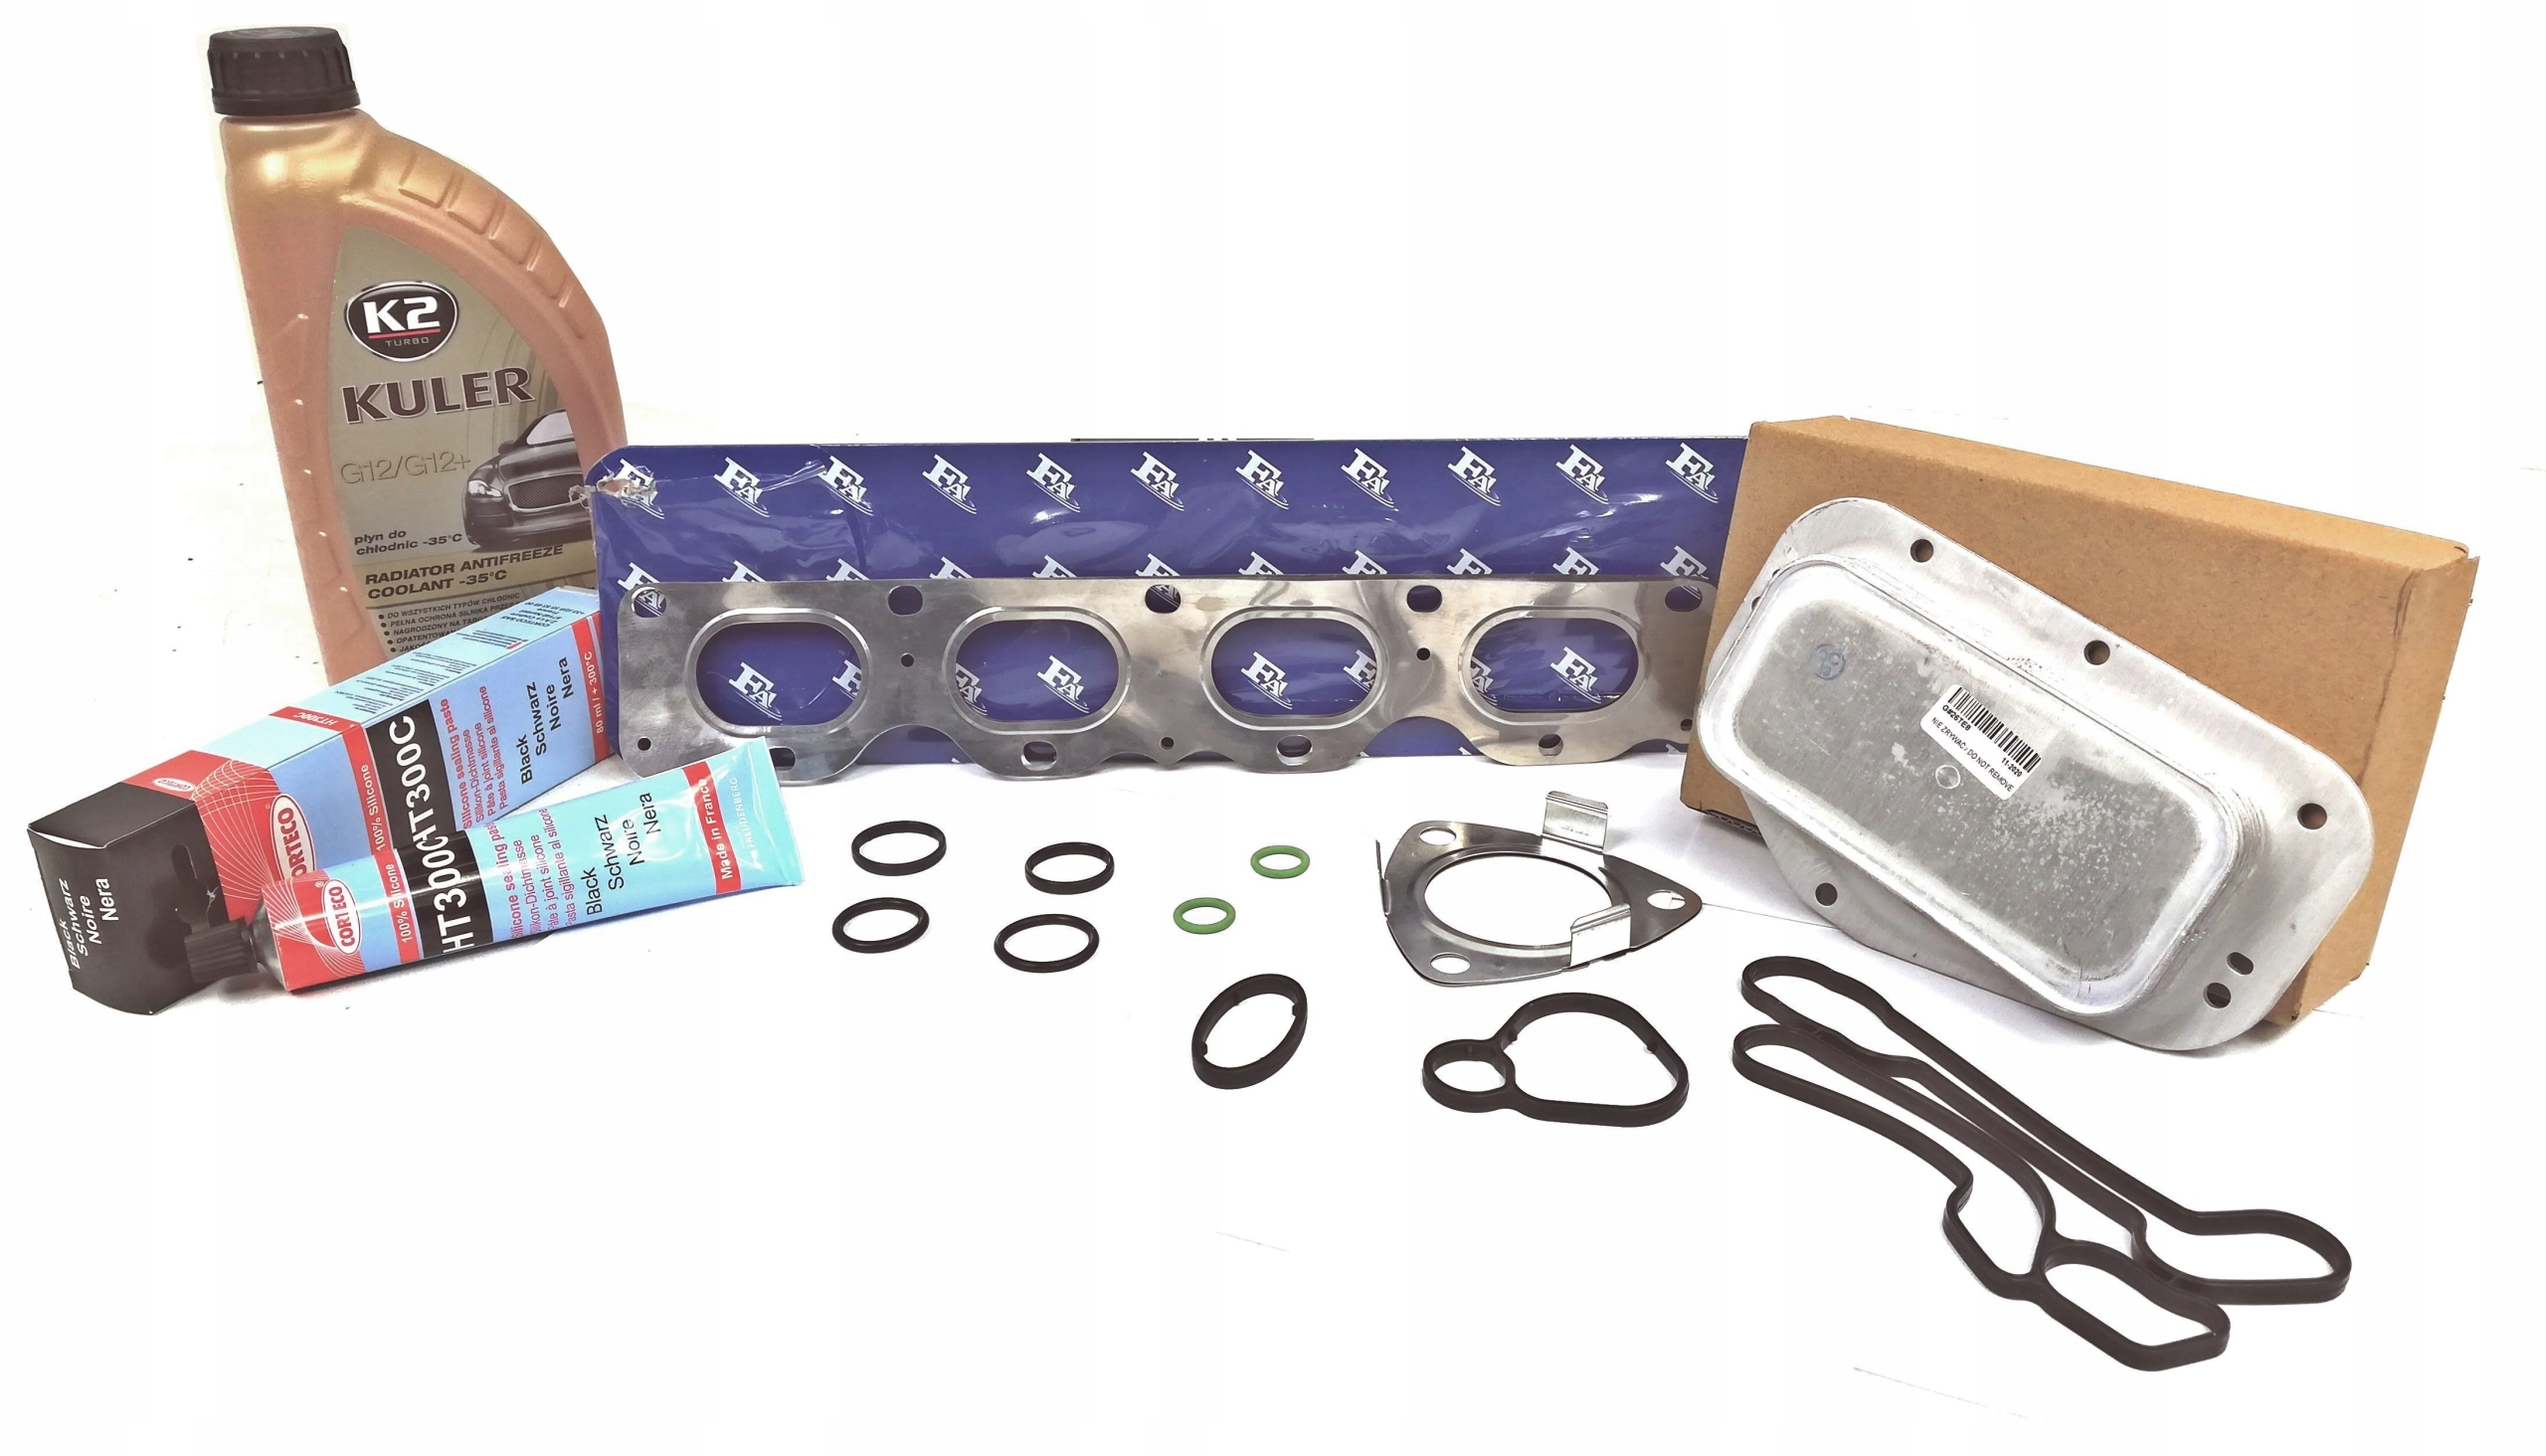 радиатор масла прокладки insignia zafira 16 18